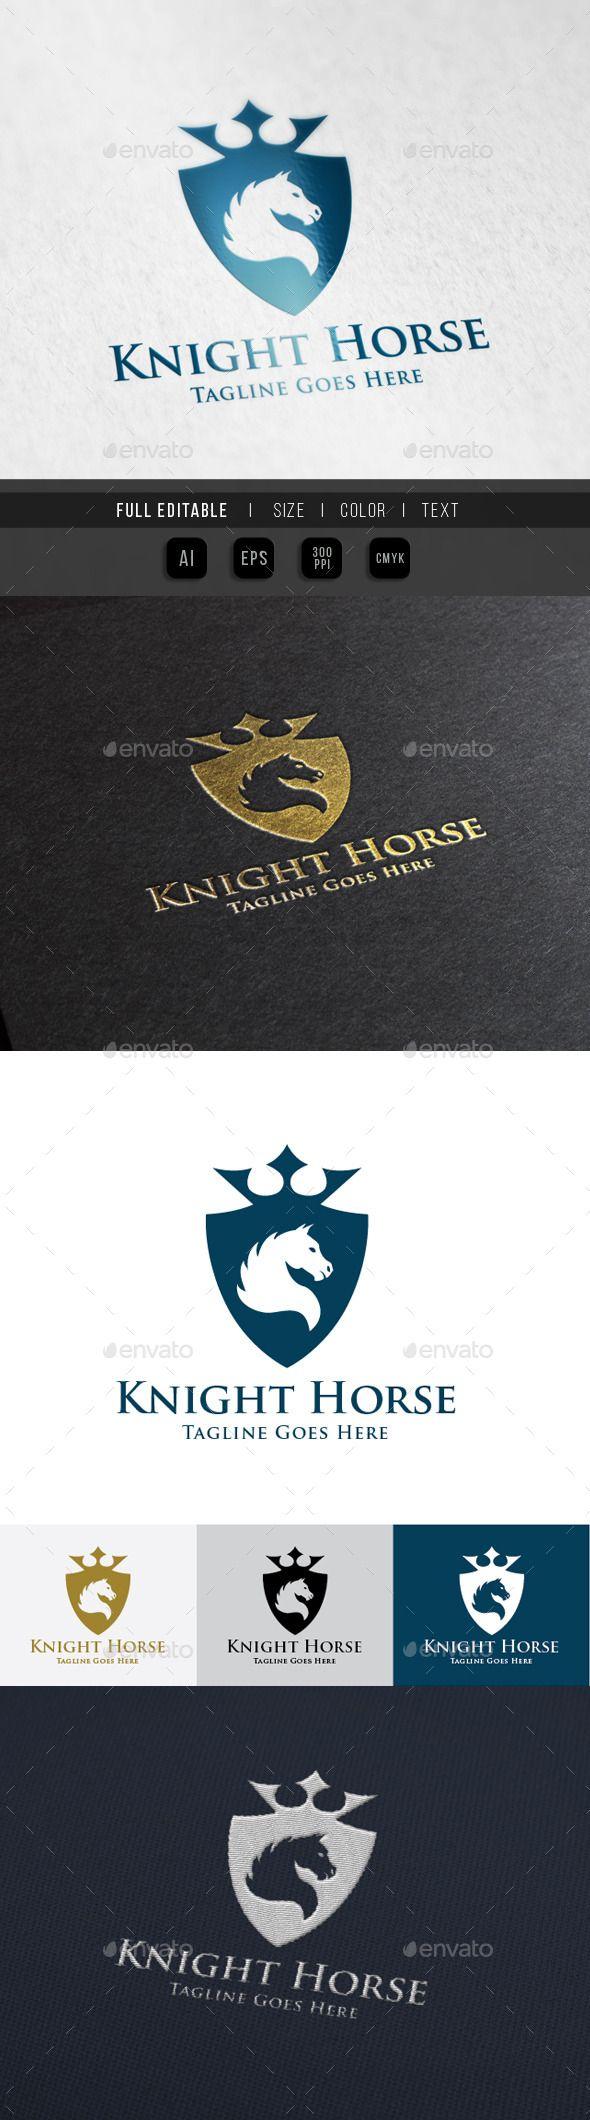 Horse Knight Shield Logo Template #design Download: http://graphicriver.net/item/horse-knight-shield-logo/10014449?ref=ksioks